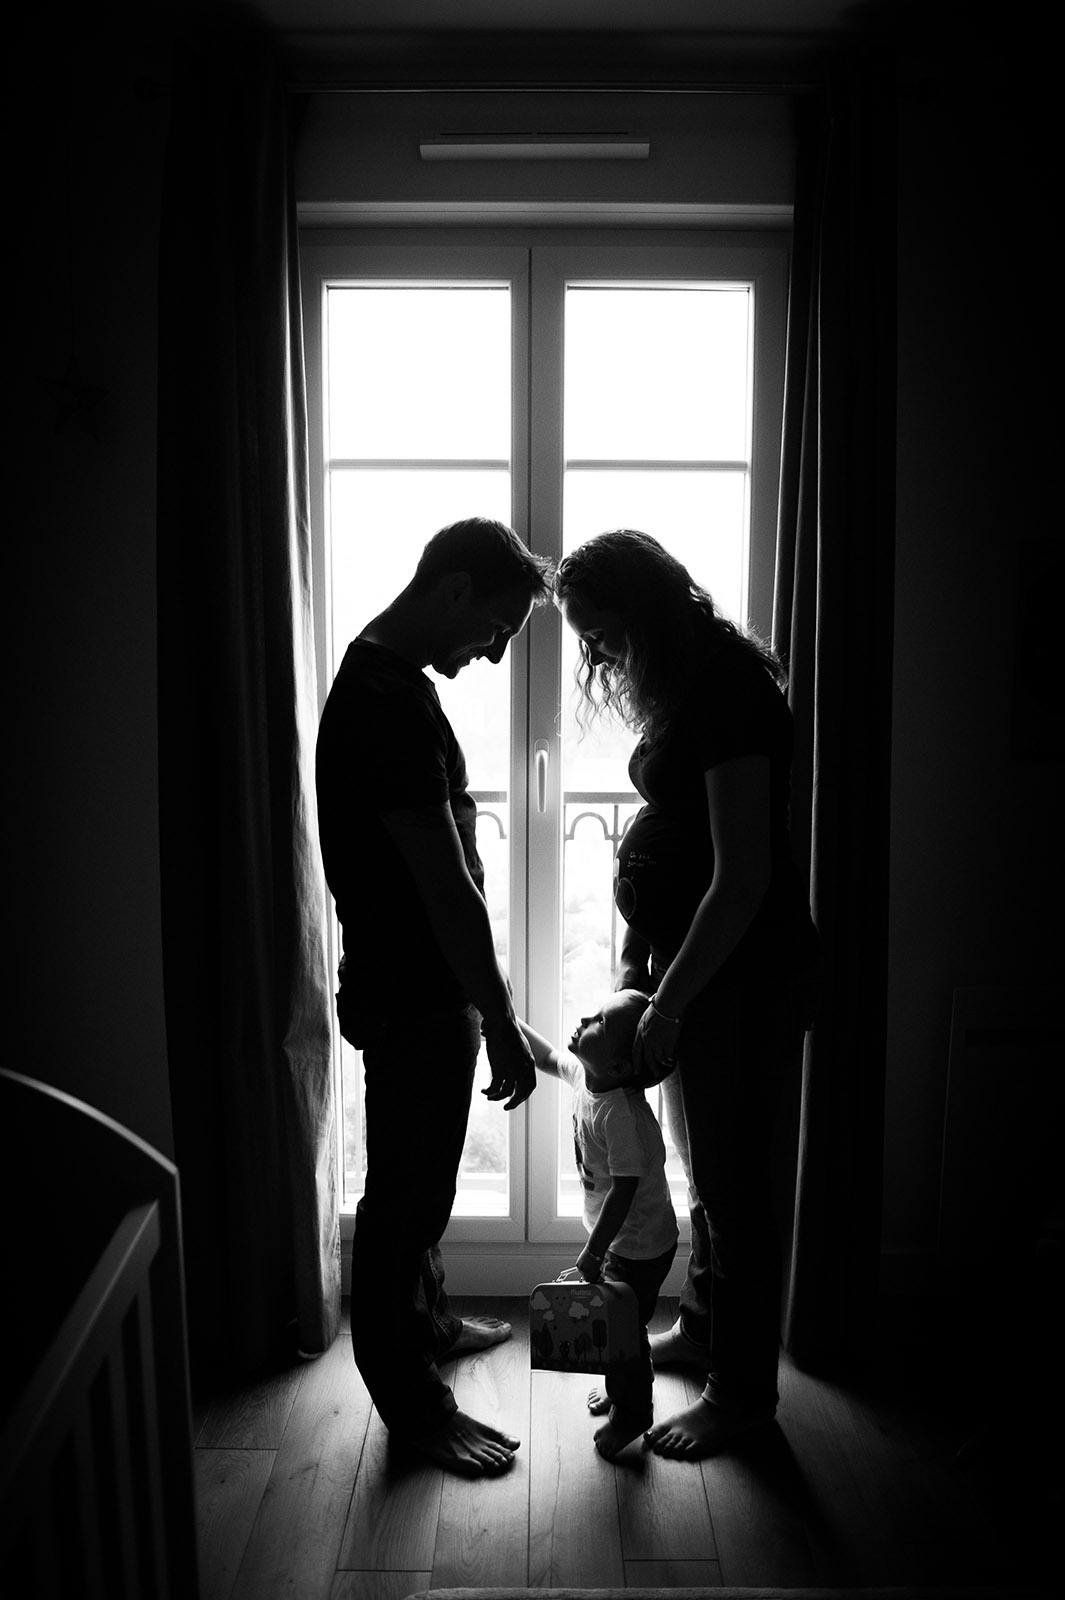 seance-photo-famille-photo-grossesse-photo-bébé-naissance-sabrina-godemert-photographe-seine-et-marne003